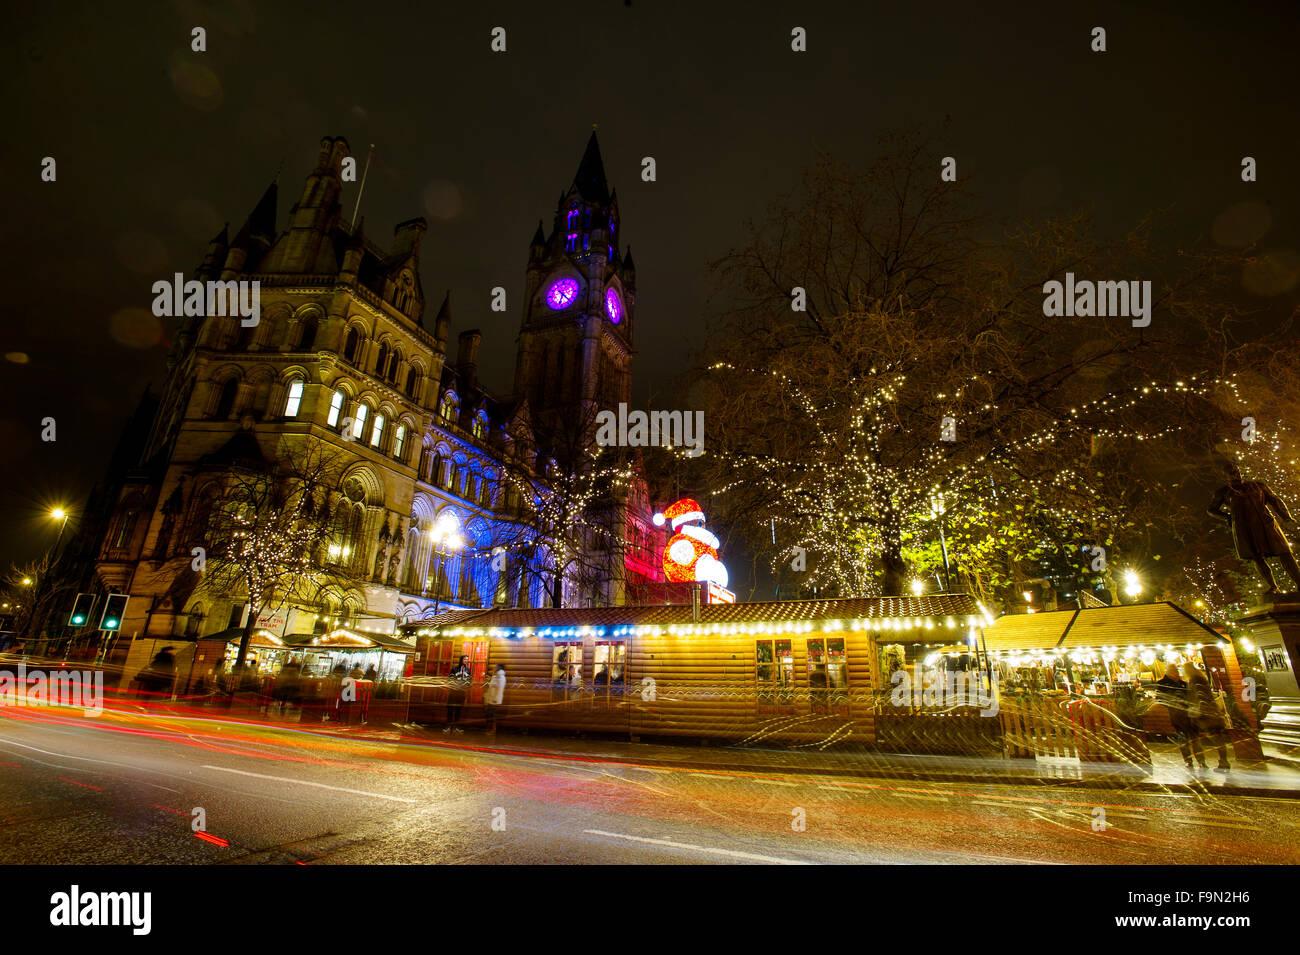 Manchester Christmas Markets Stock Photos & Manchester